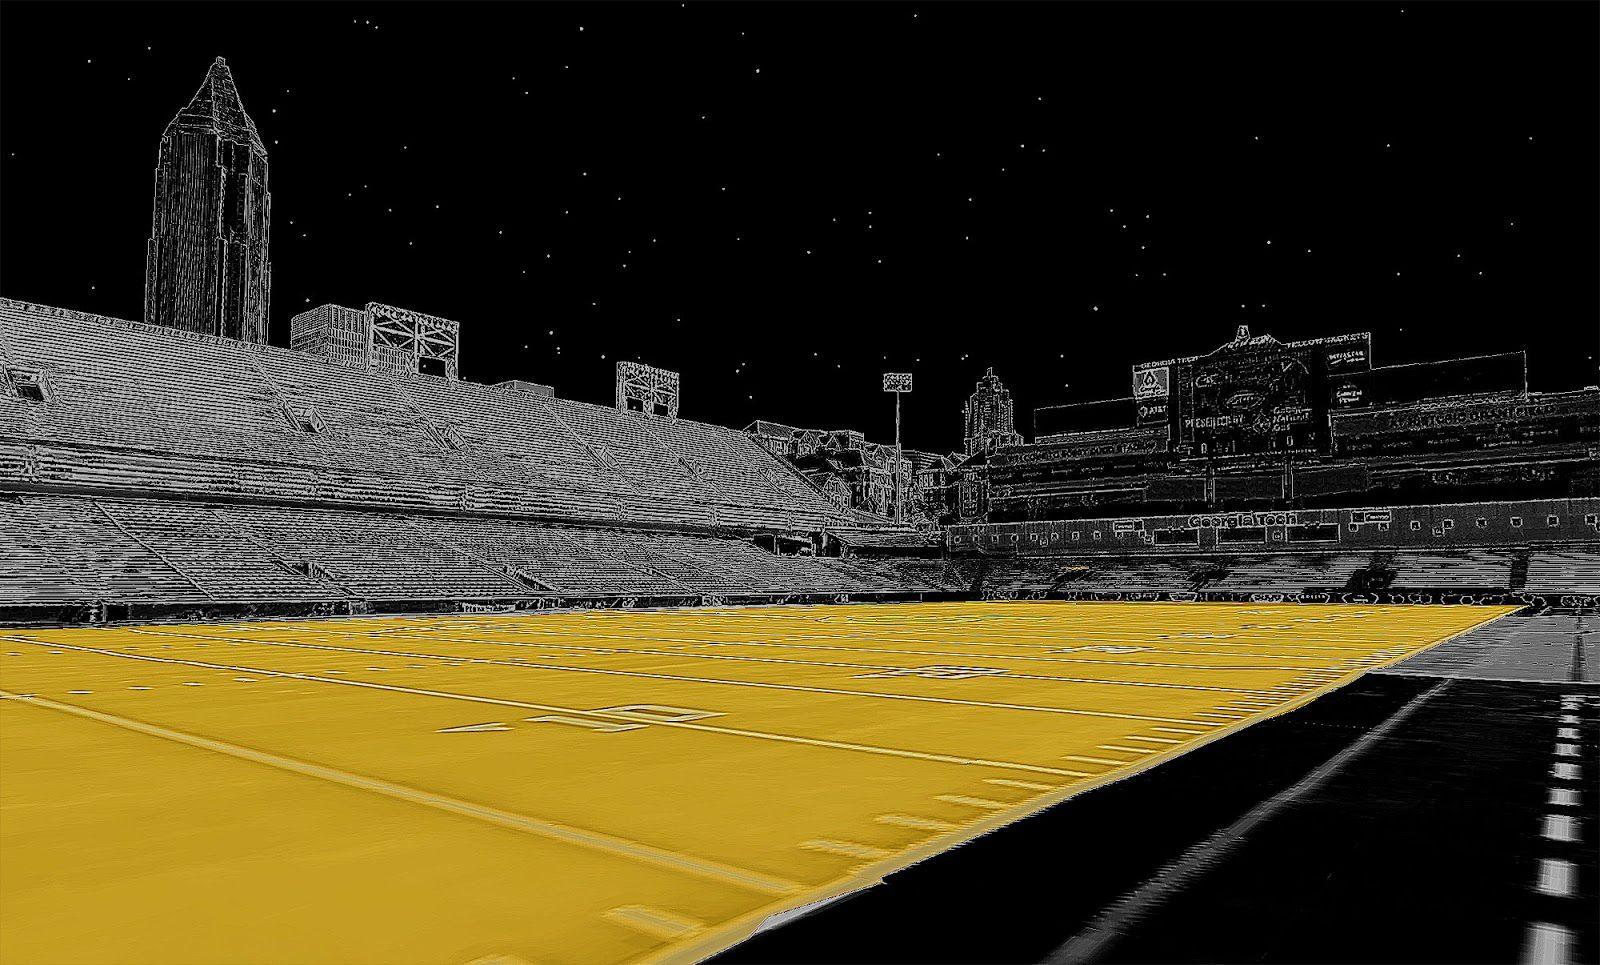 Closeup of Bobby Dodd Stadium.